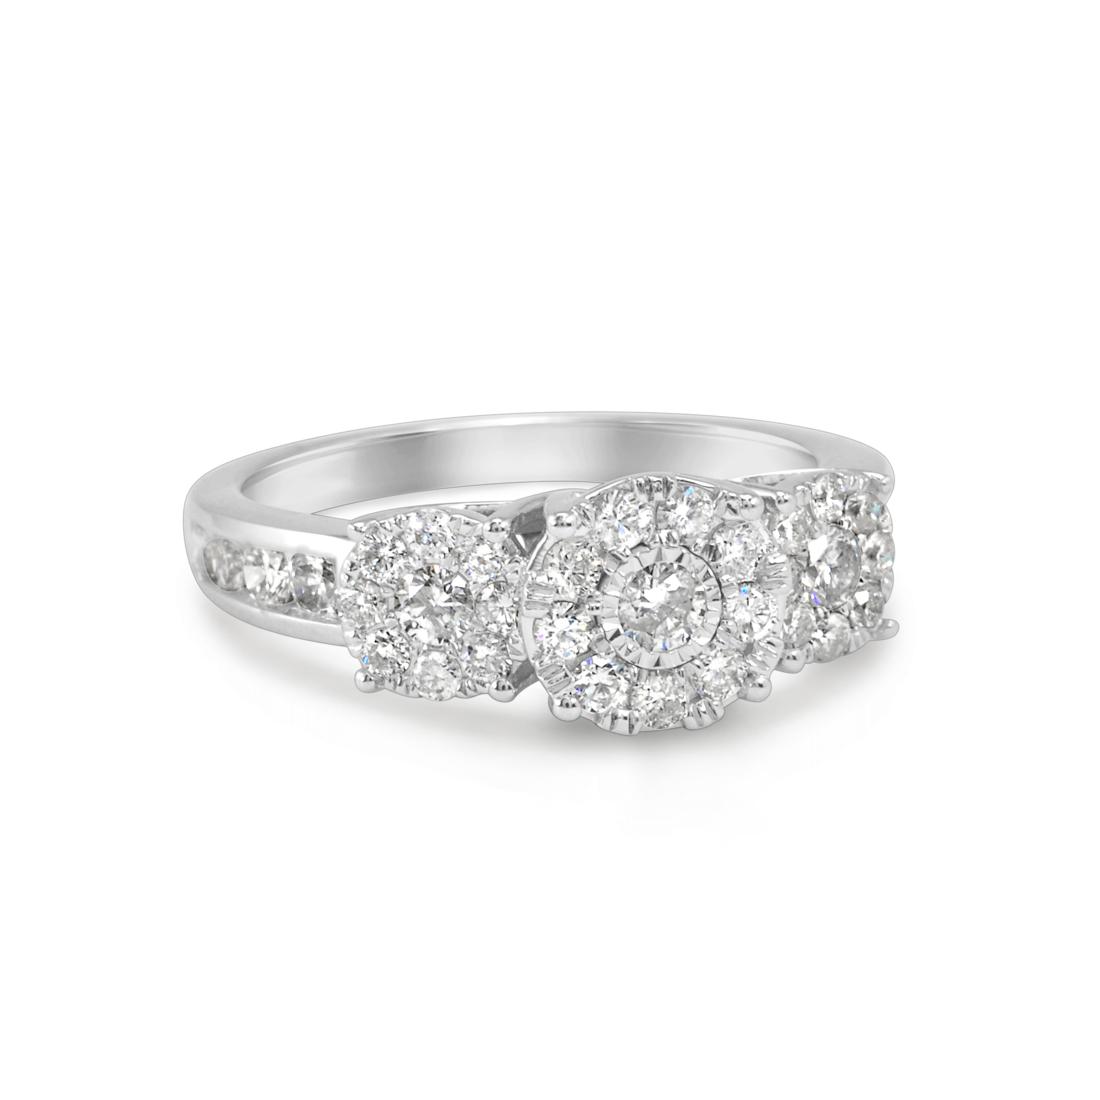 Ladies' Invisible Set Diamond Ring